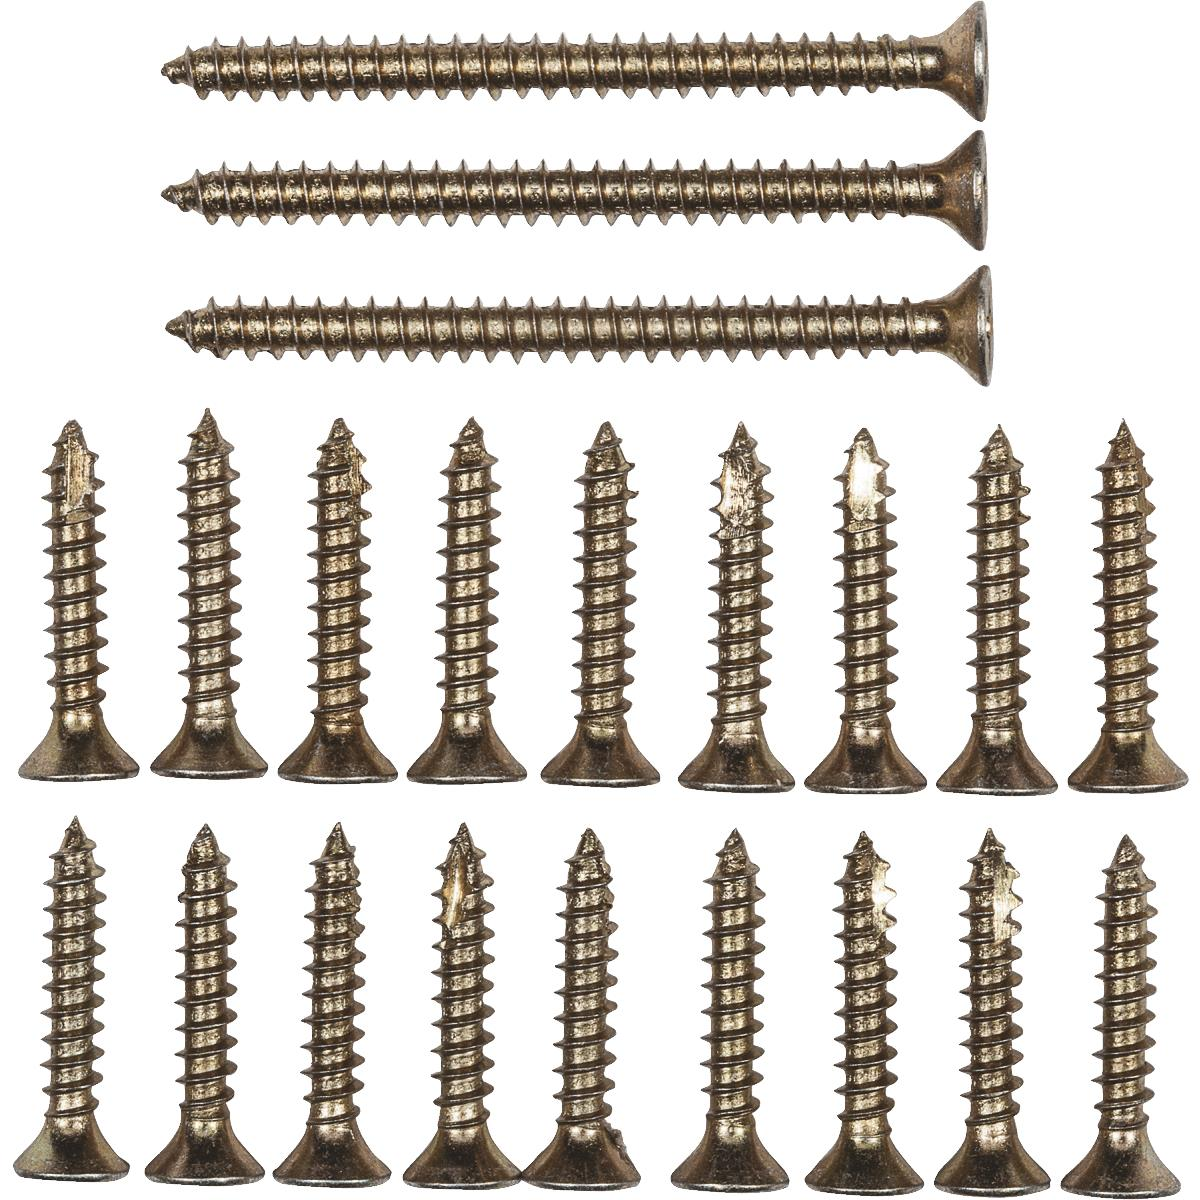 National Mfg N185-199 V521 3-1//2 Inch Commercial Brass Adjustable Full Mortise Spring Hinge